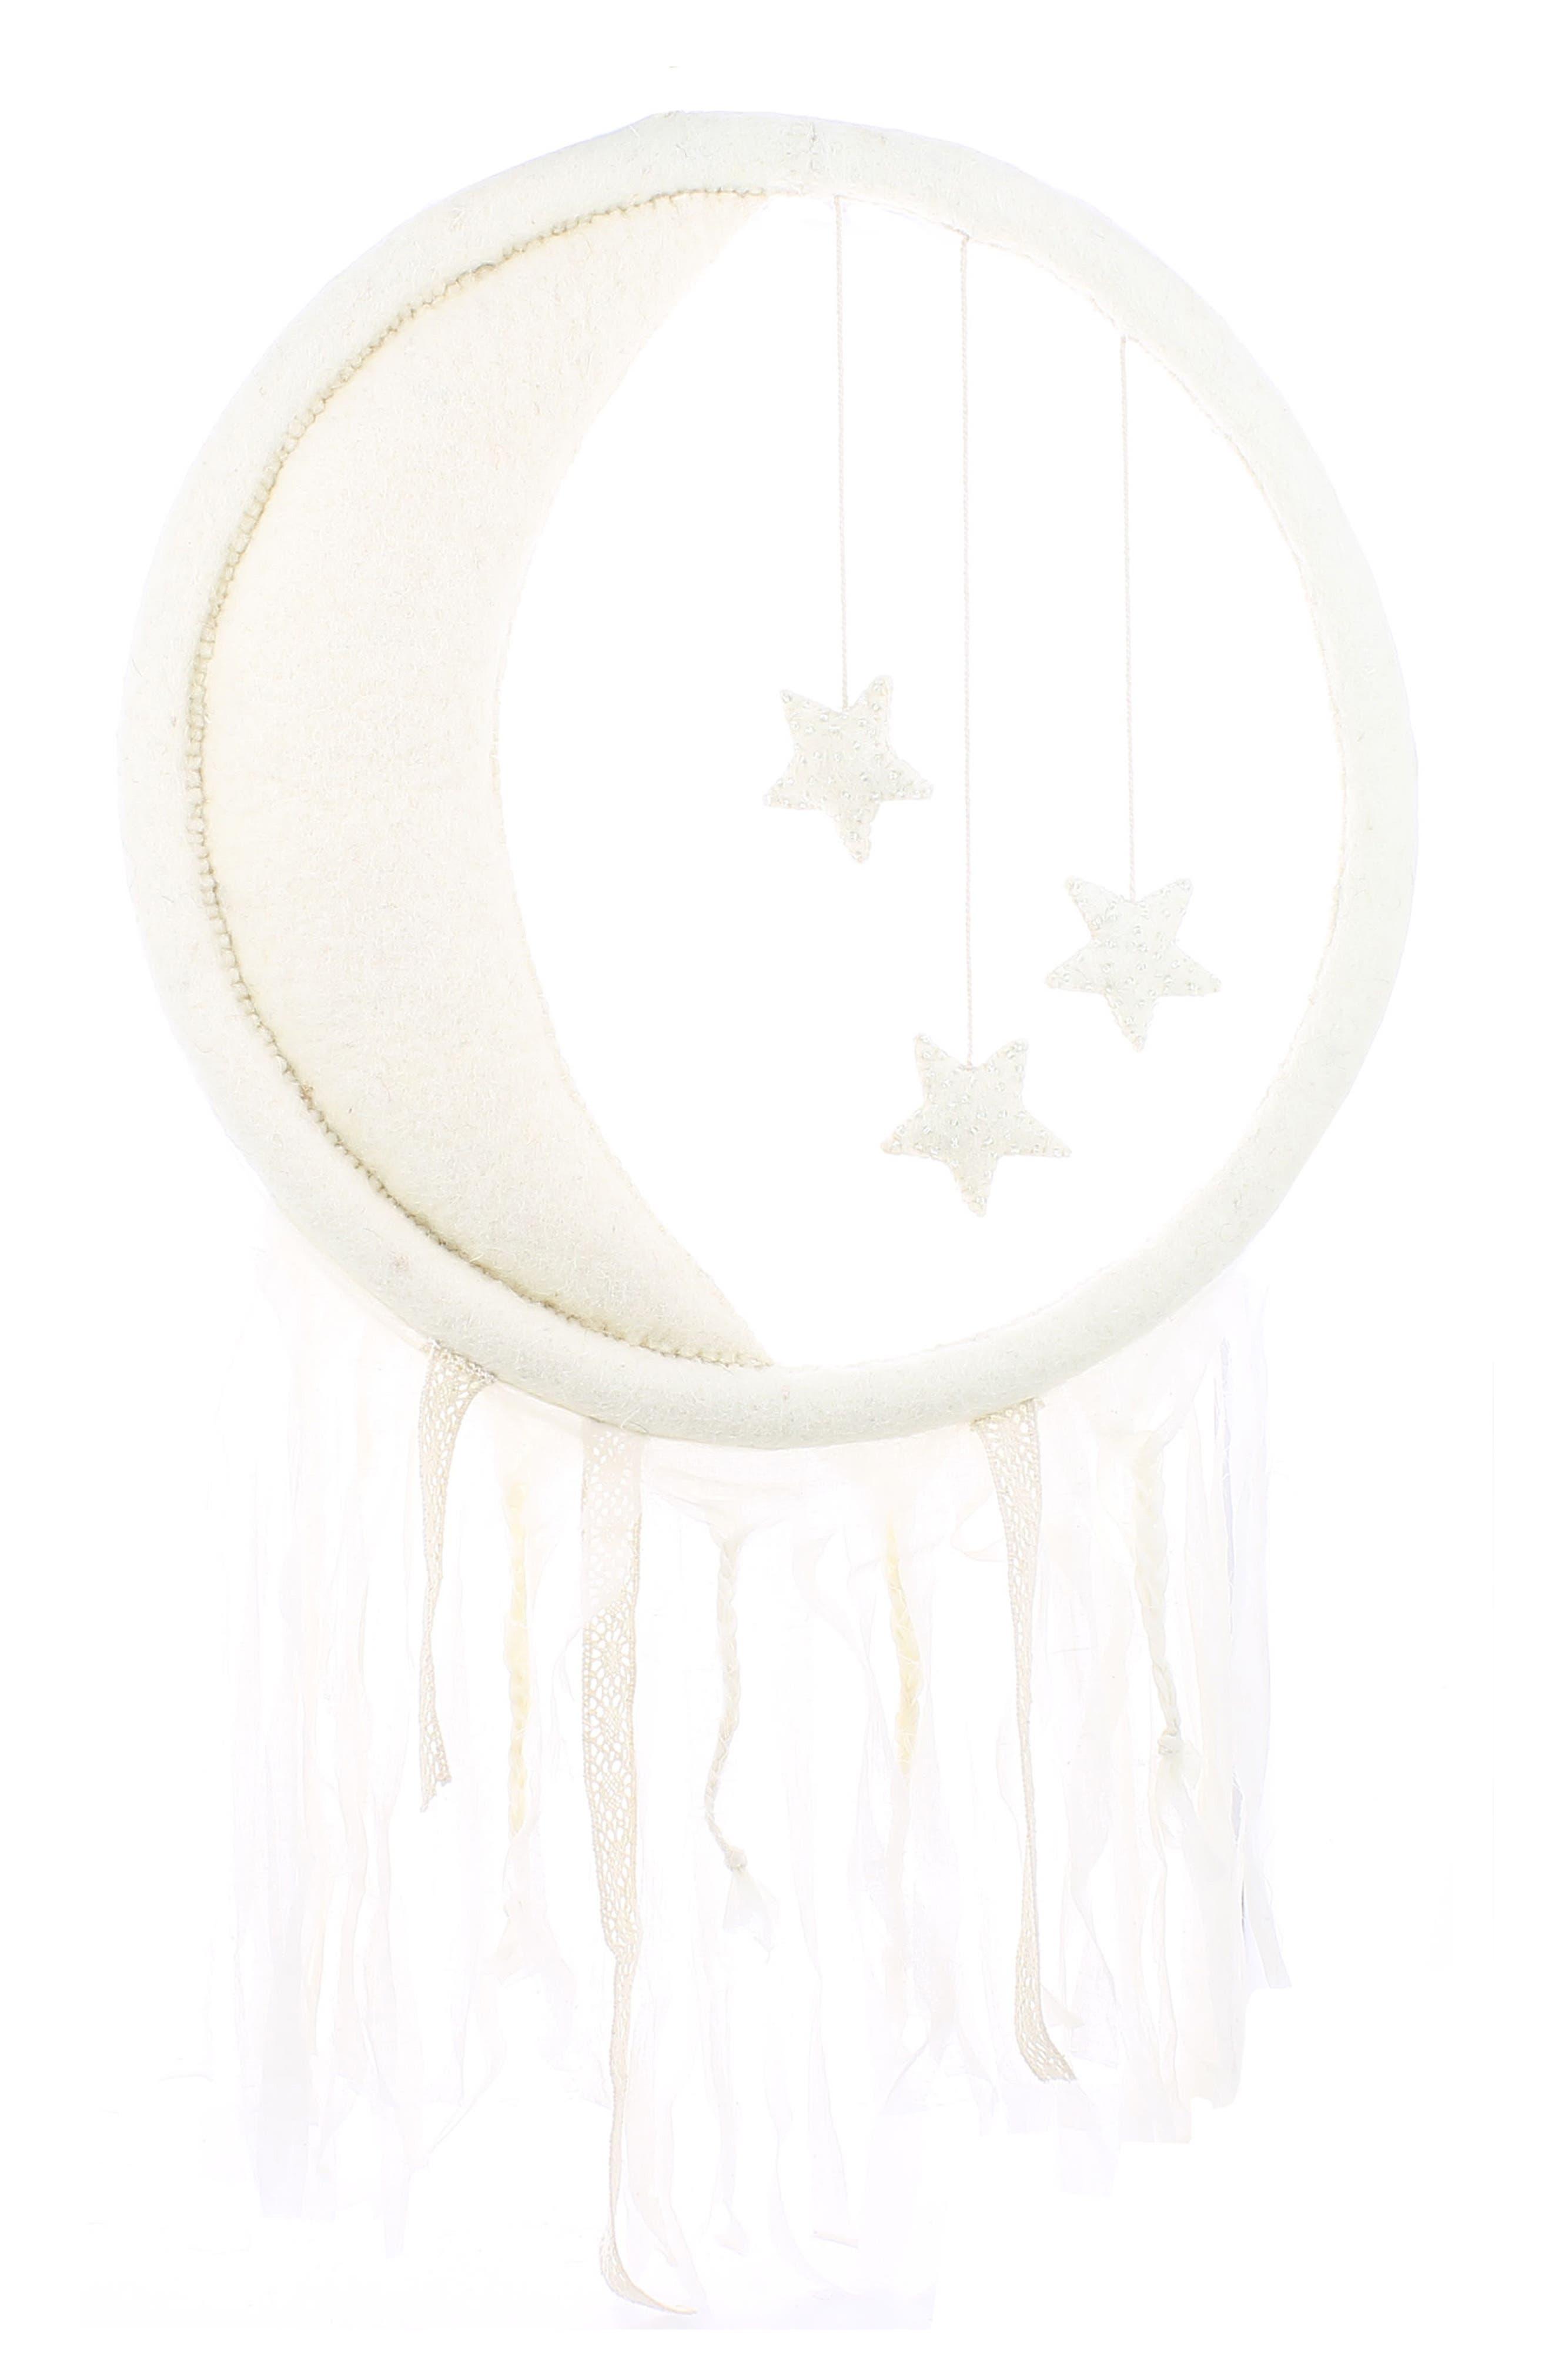 Main Image - Fiona Walker Crescent Moon & Beaded Star Wall Decoration